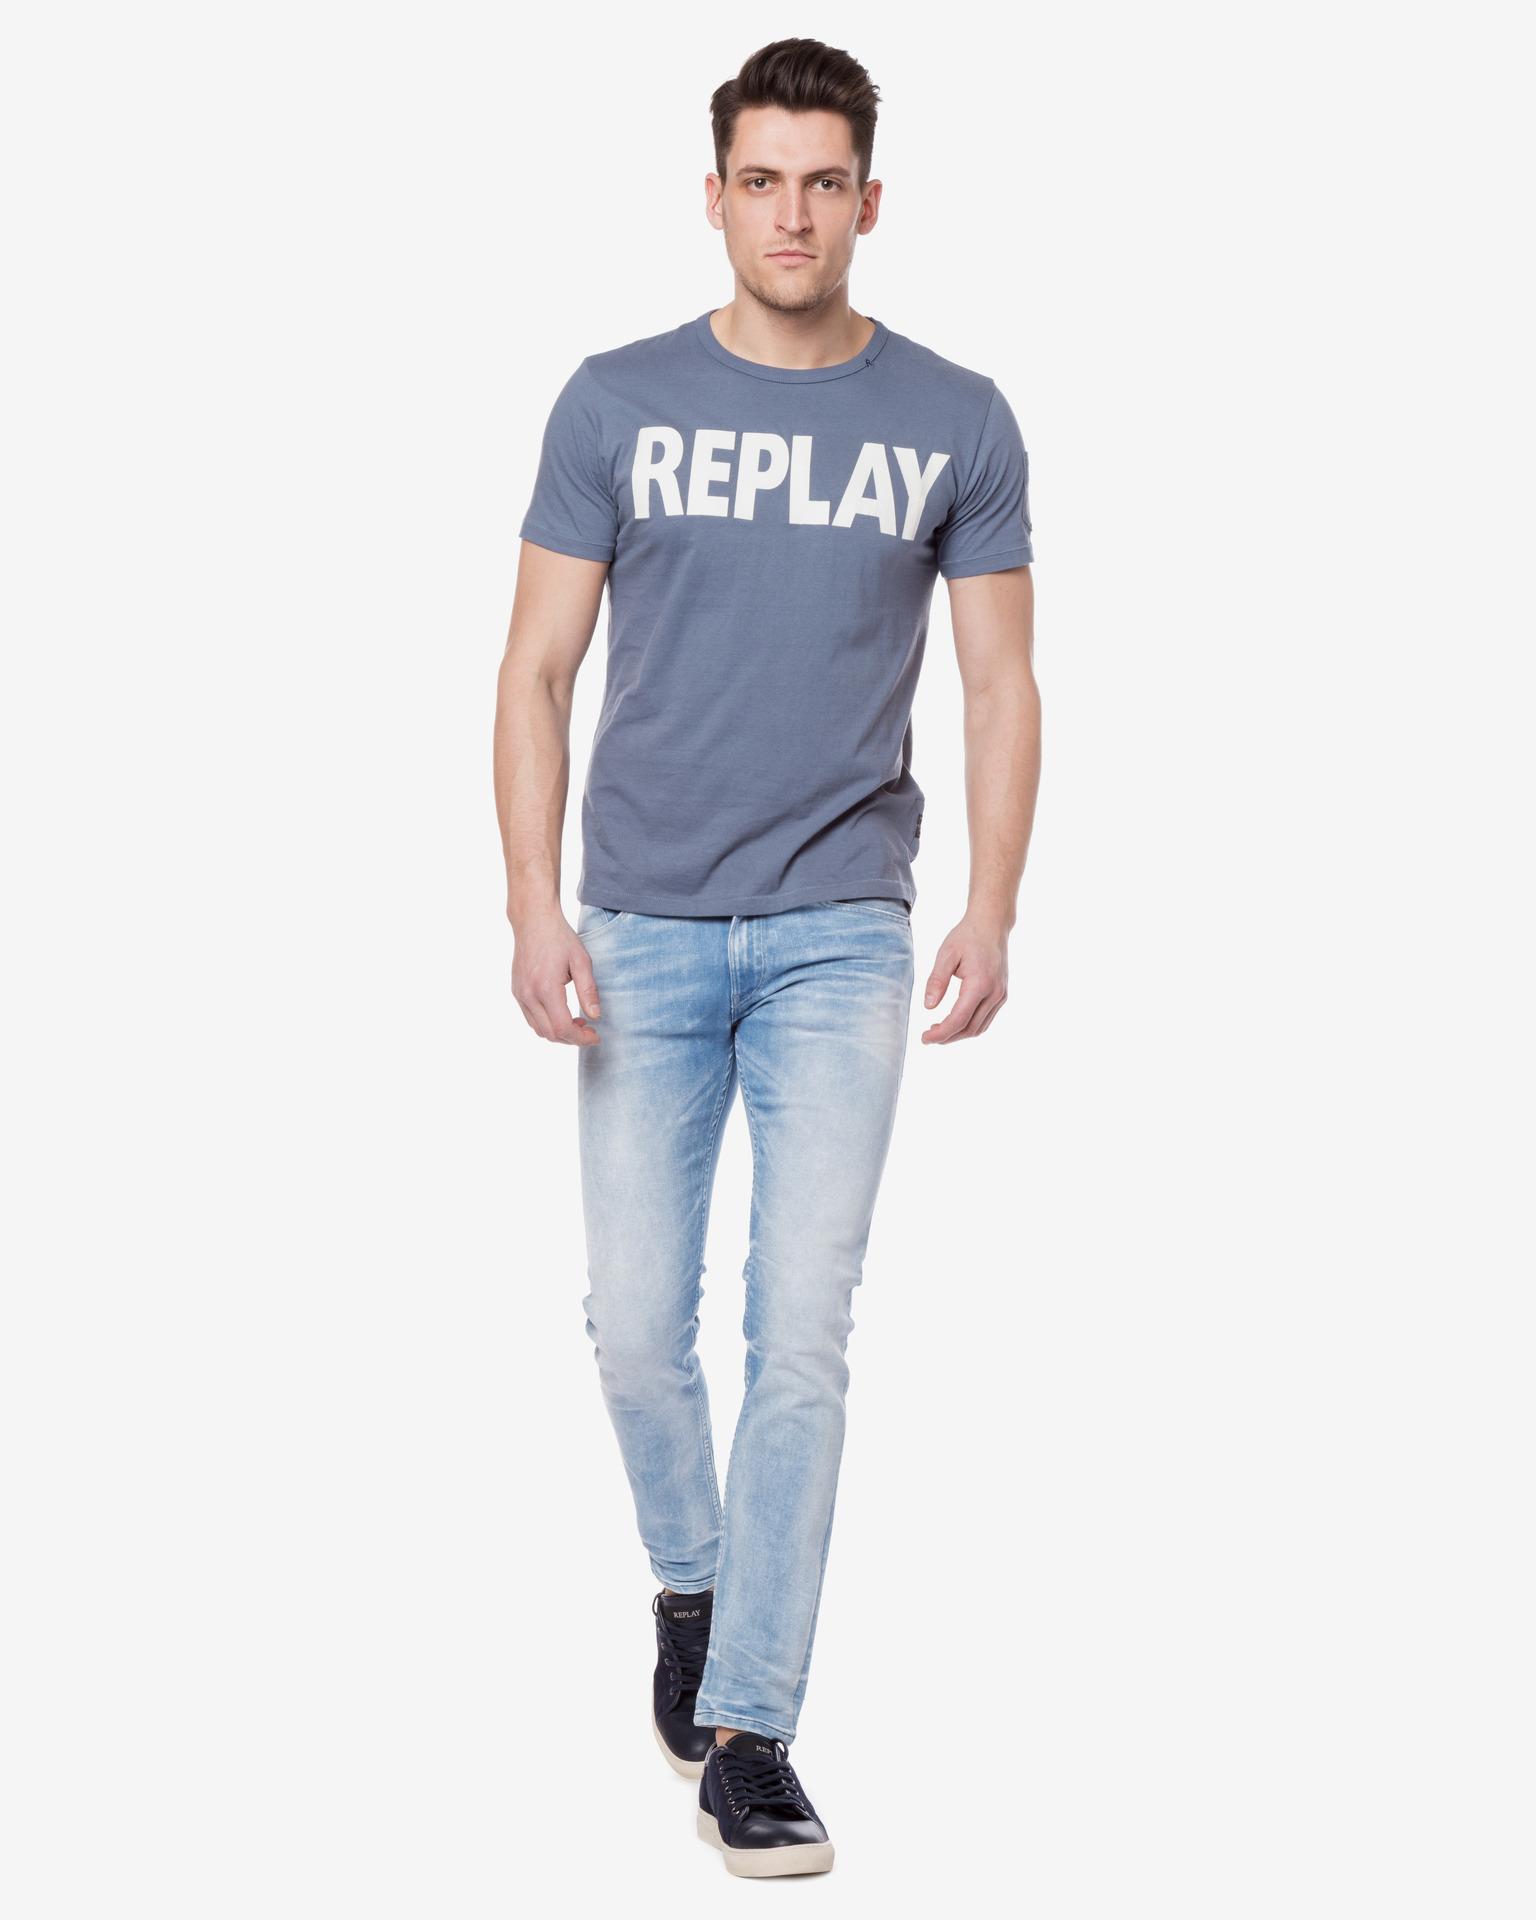 Replay - Jondrill Jeans Bibloo.com